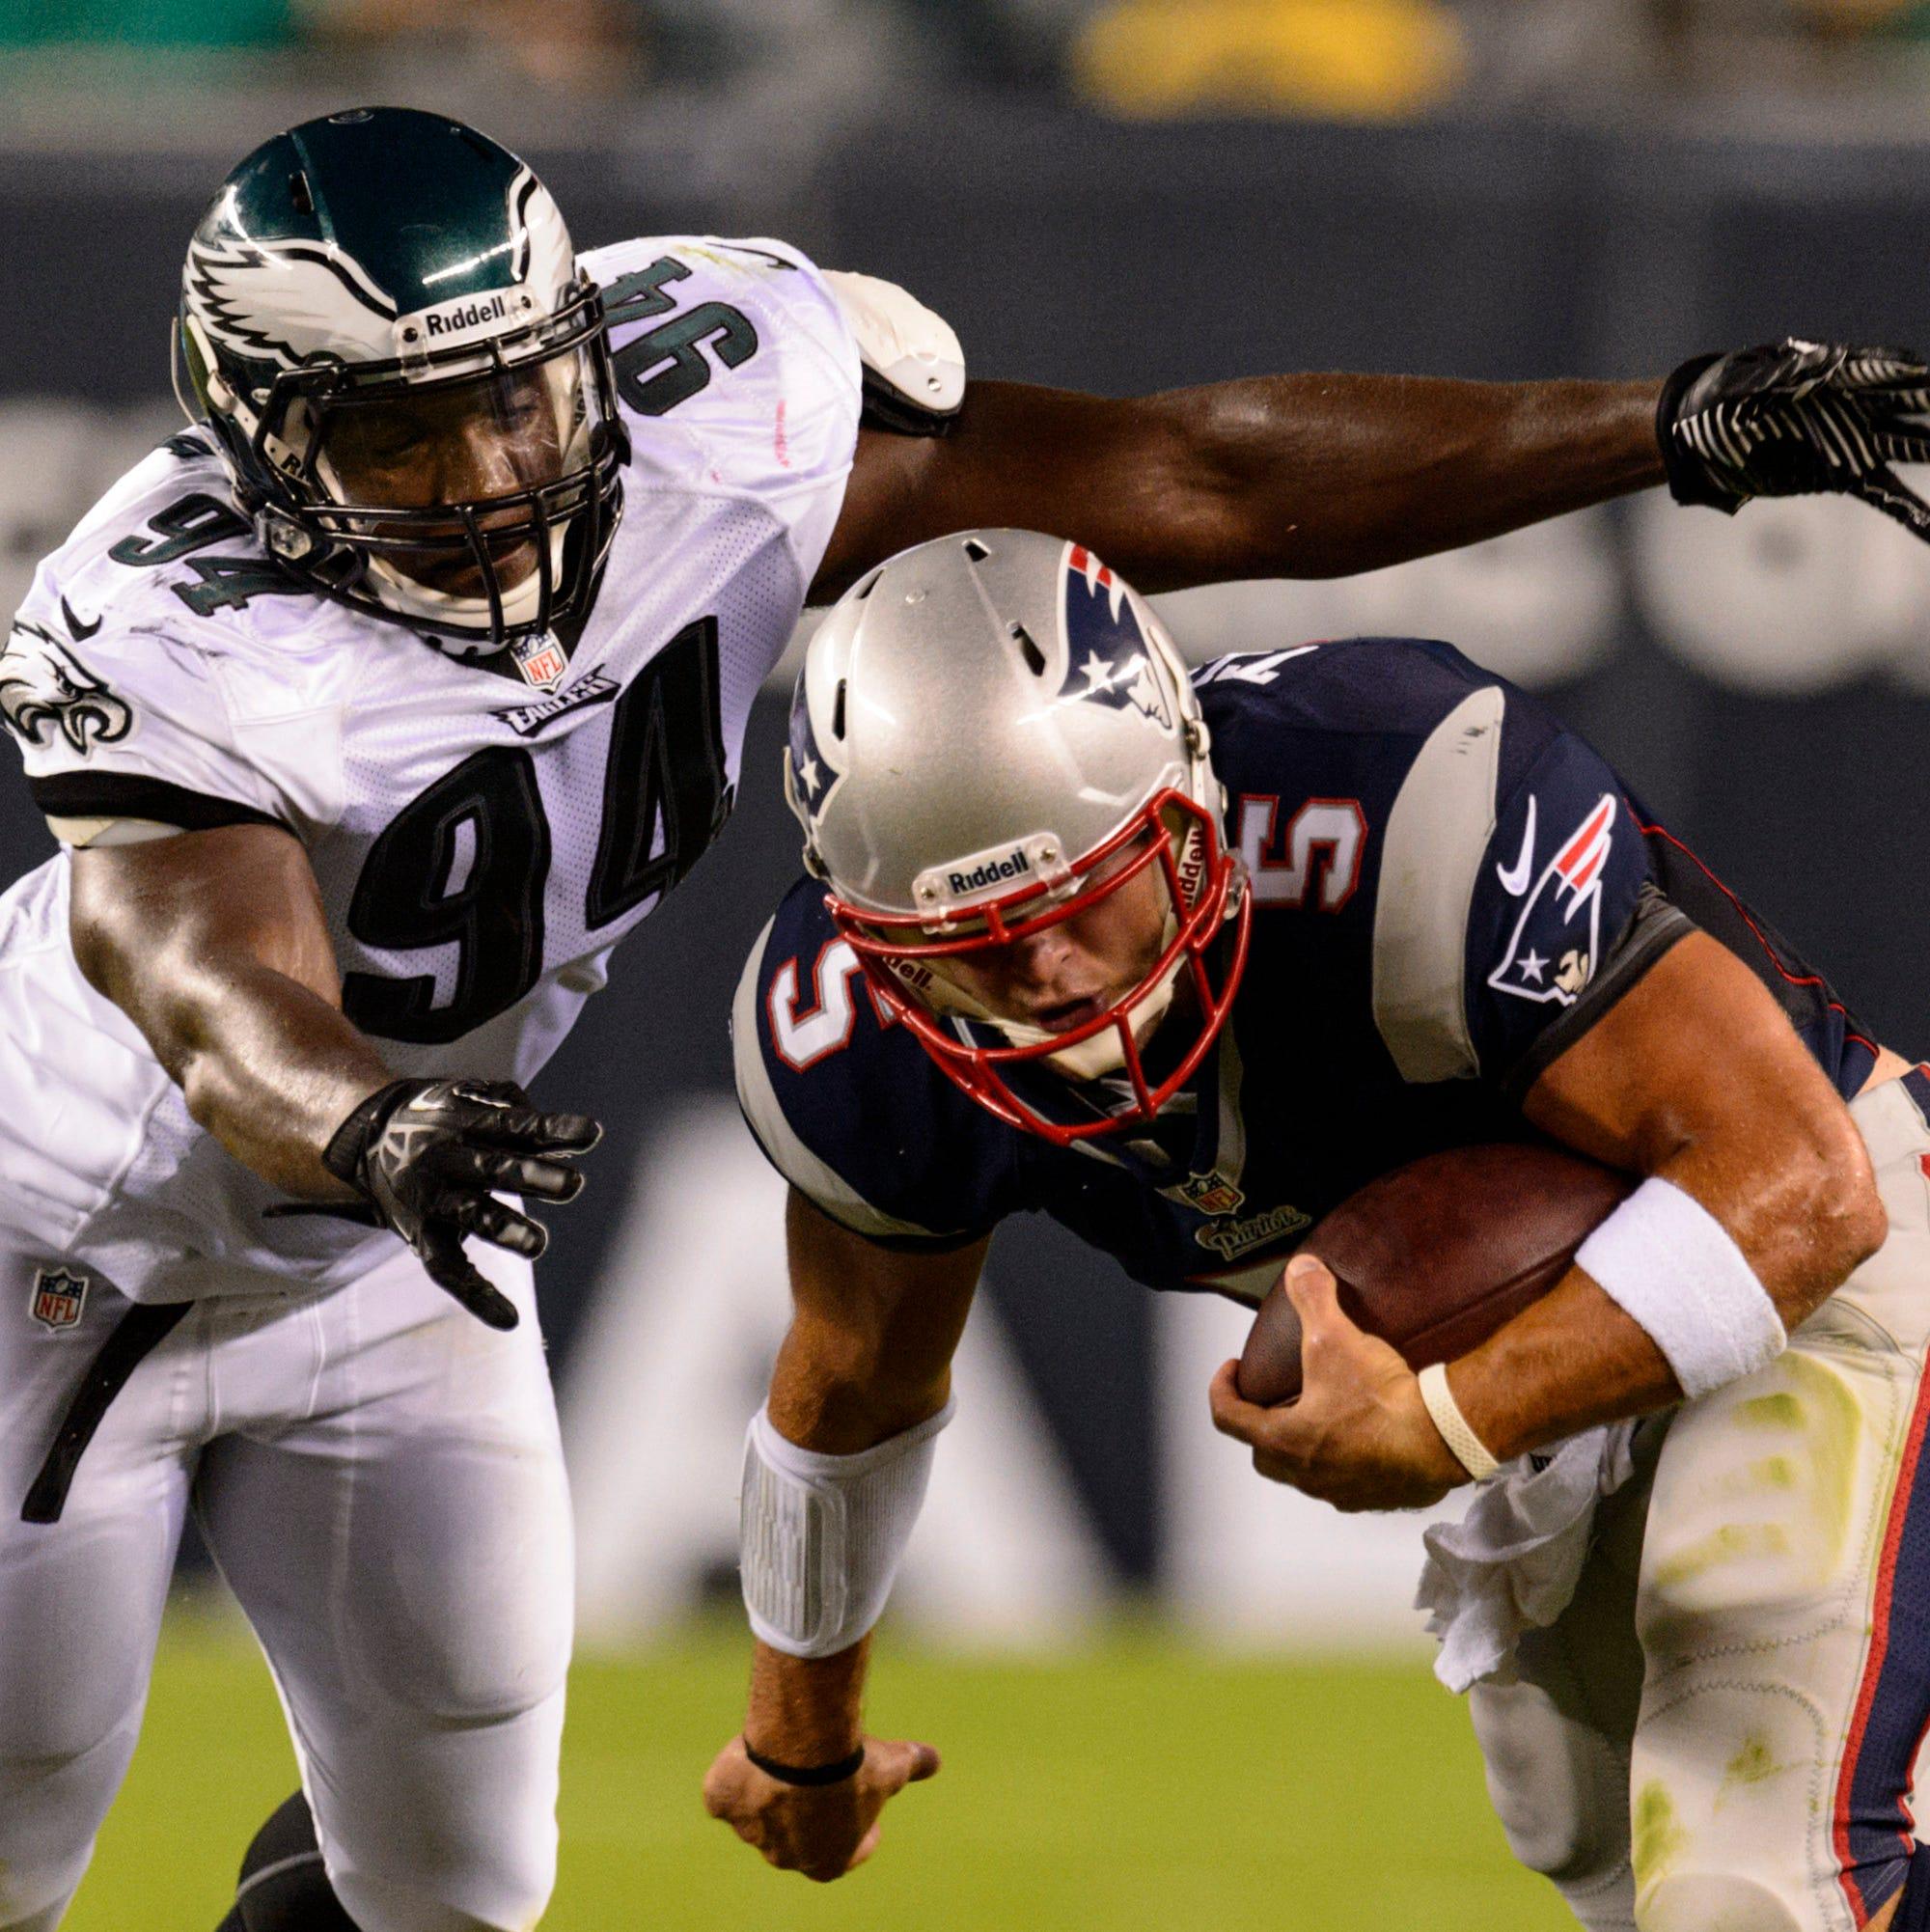 Photos: Best of NFL preseason